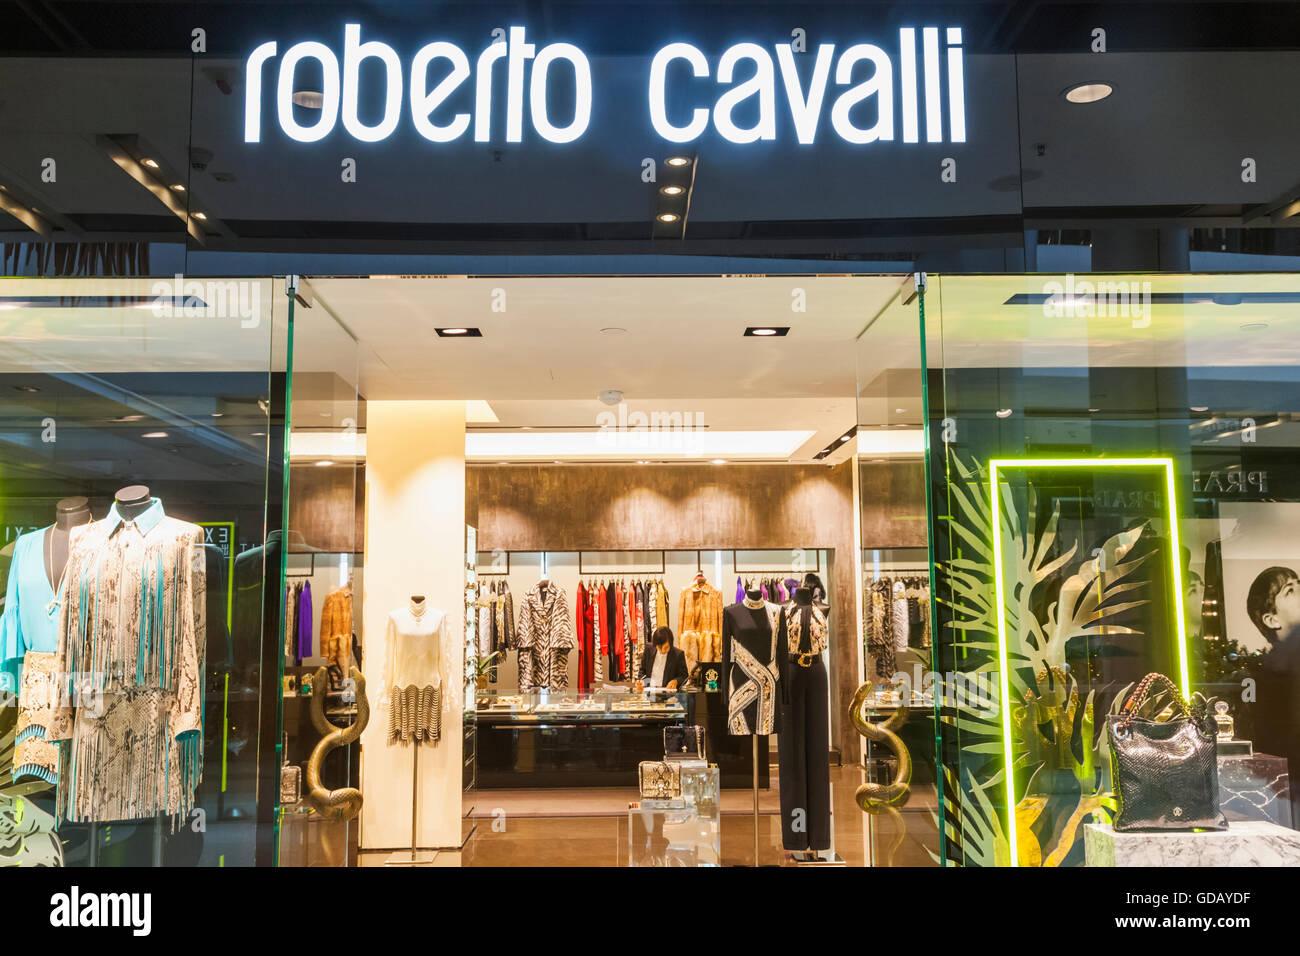 La Chine, Hong Kong, Central,SFI Shopping Mall, Roberto Cavalli Store Banque D'Images